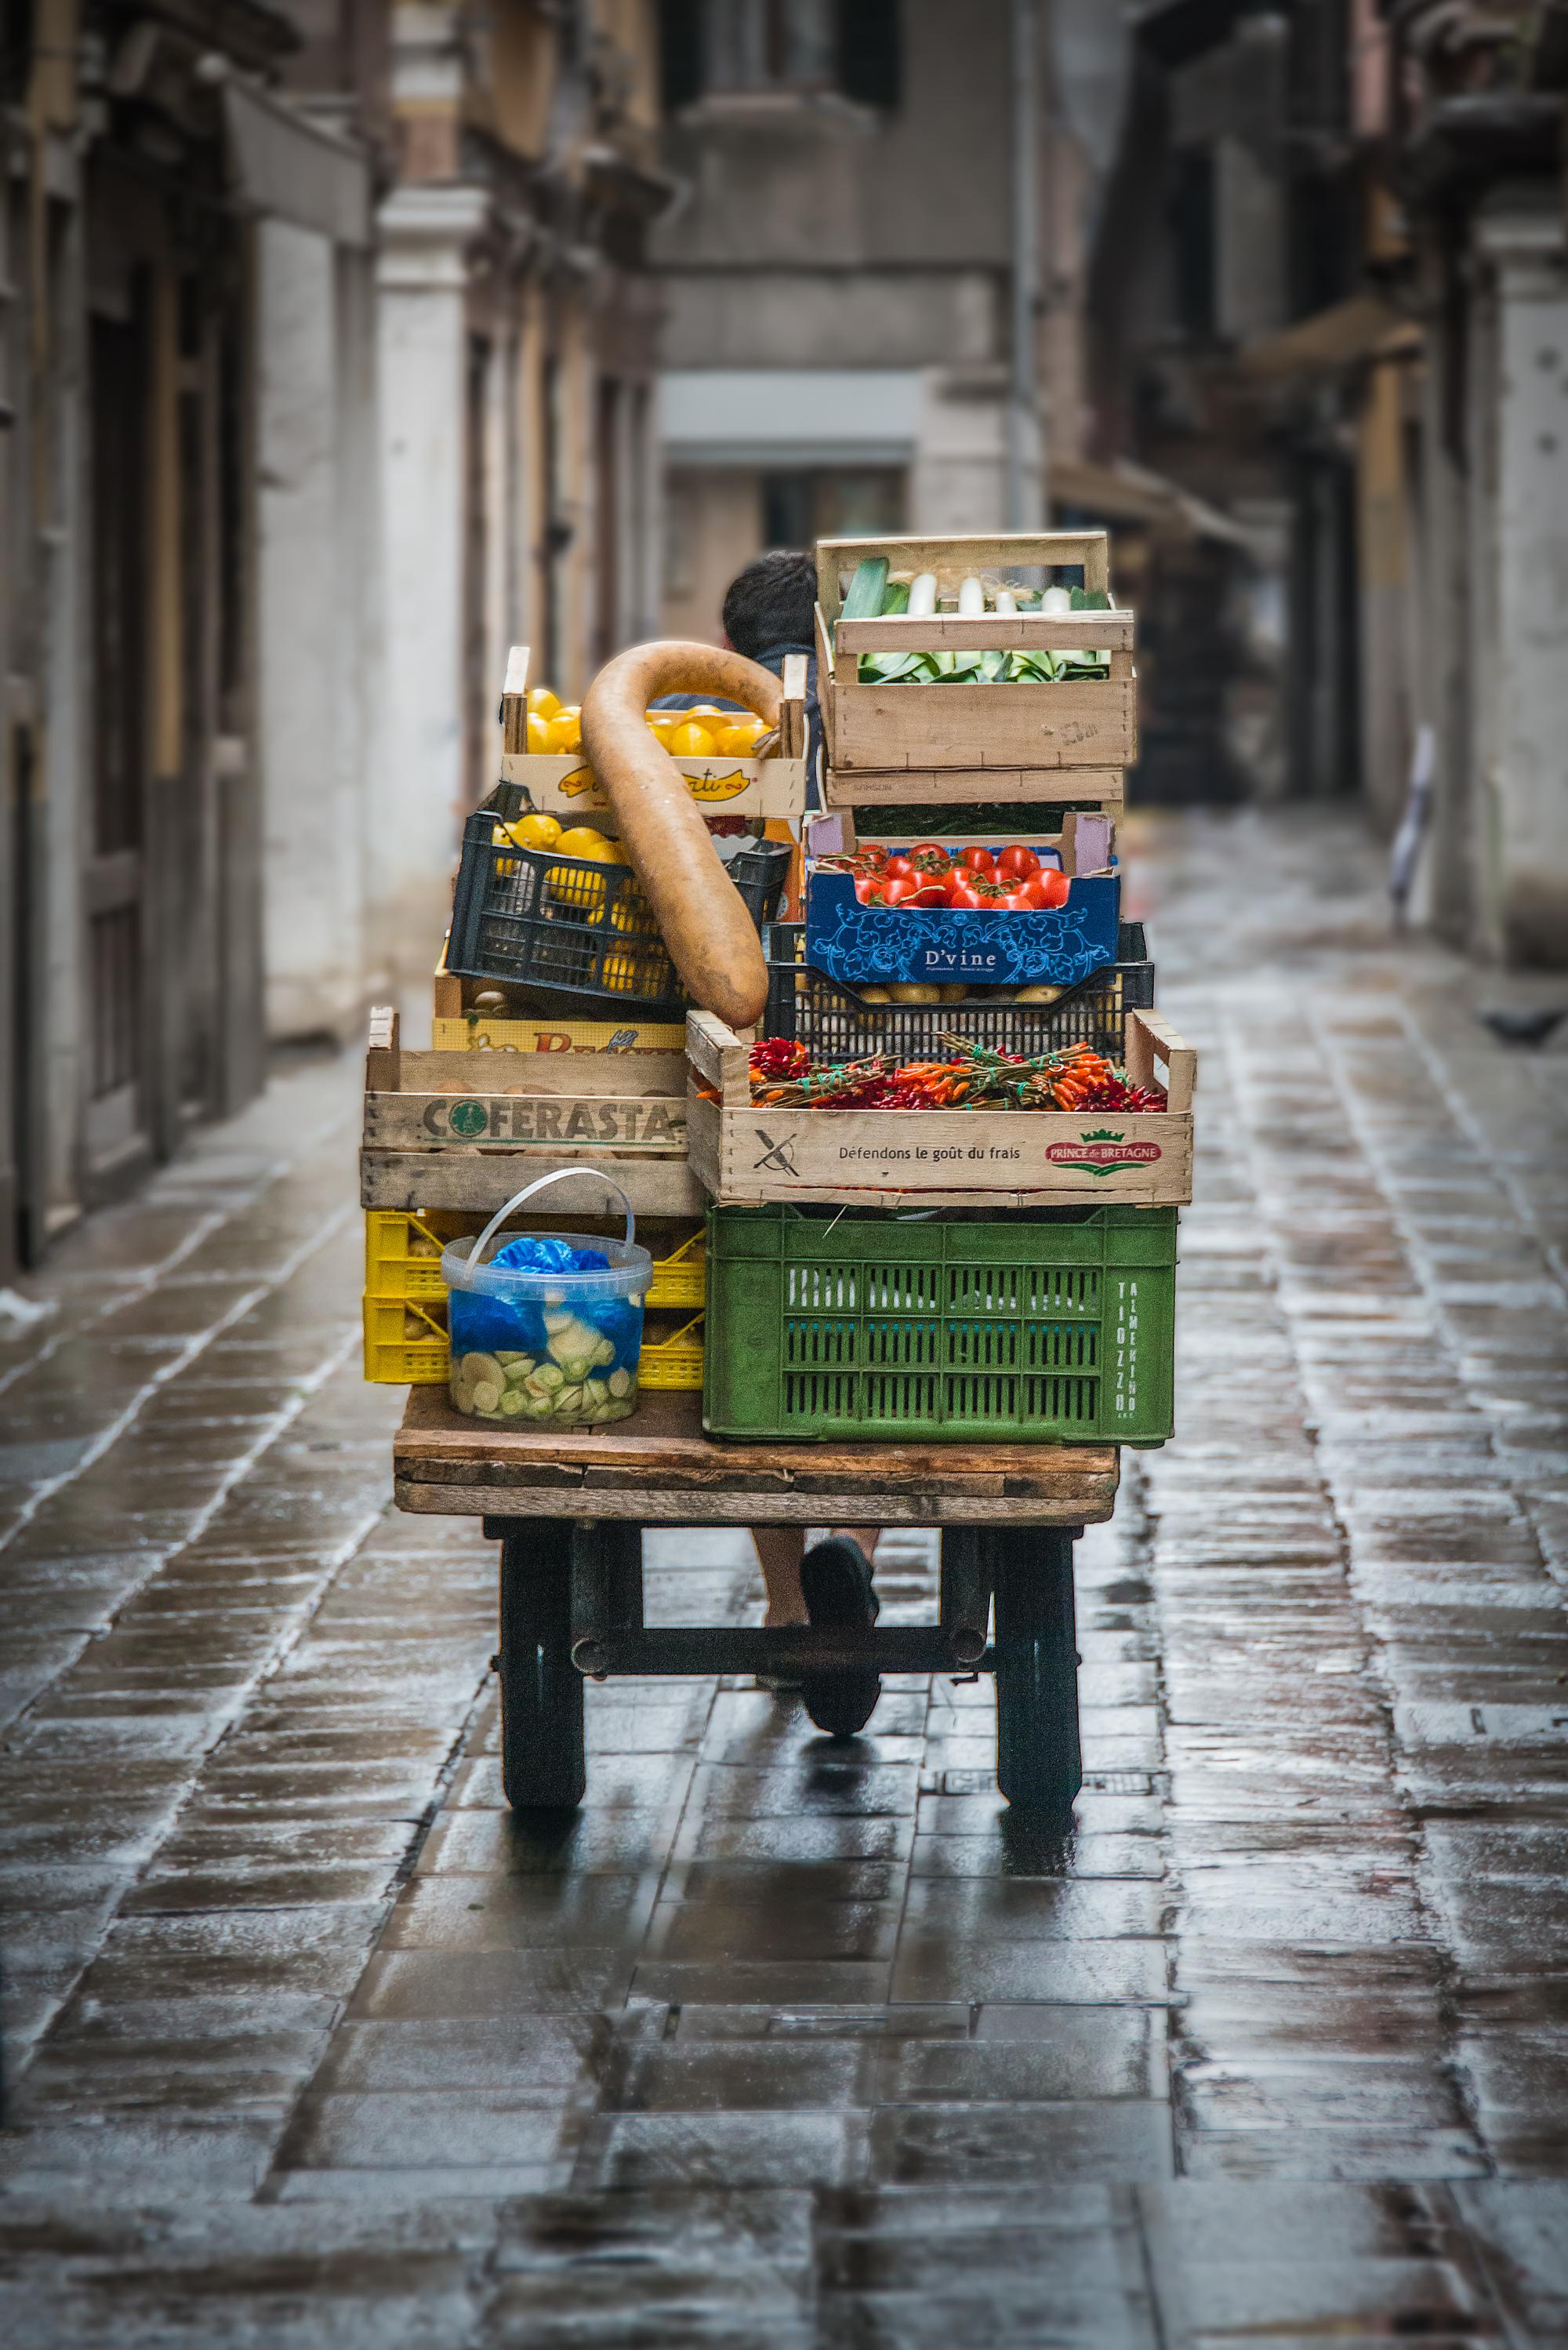 On the way to Rialto Market